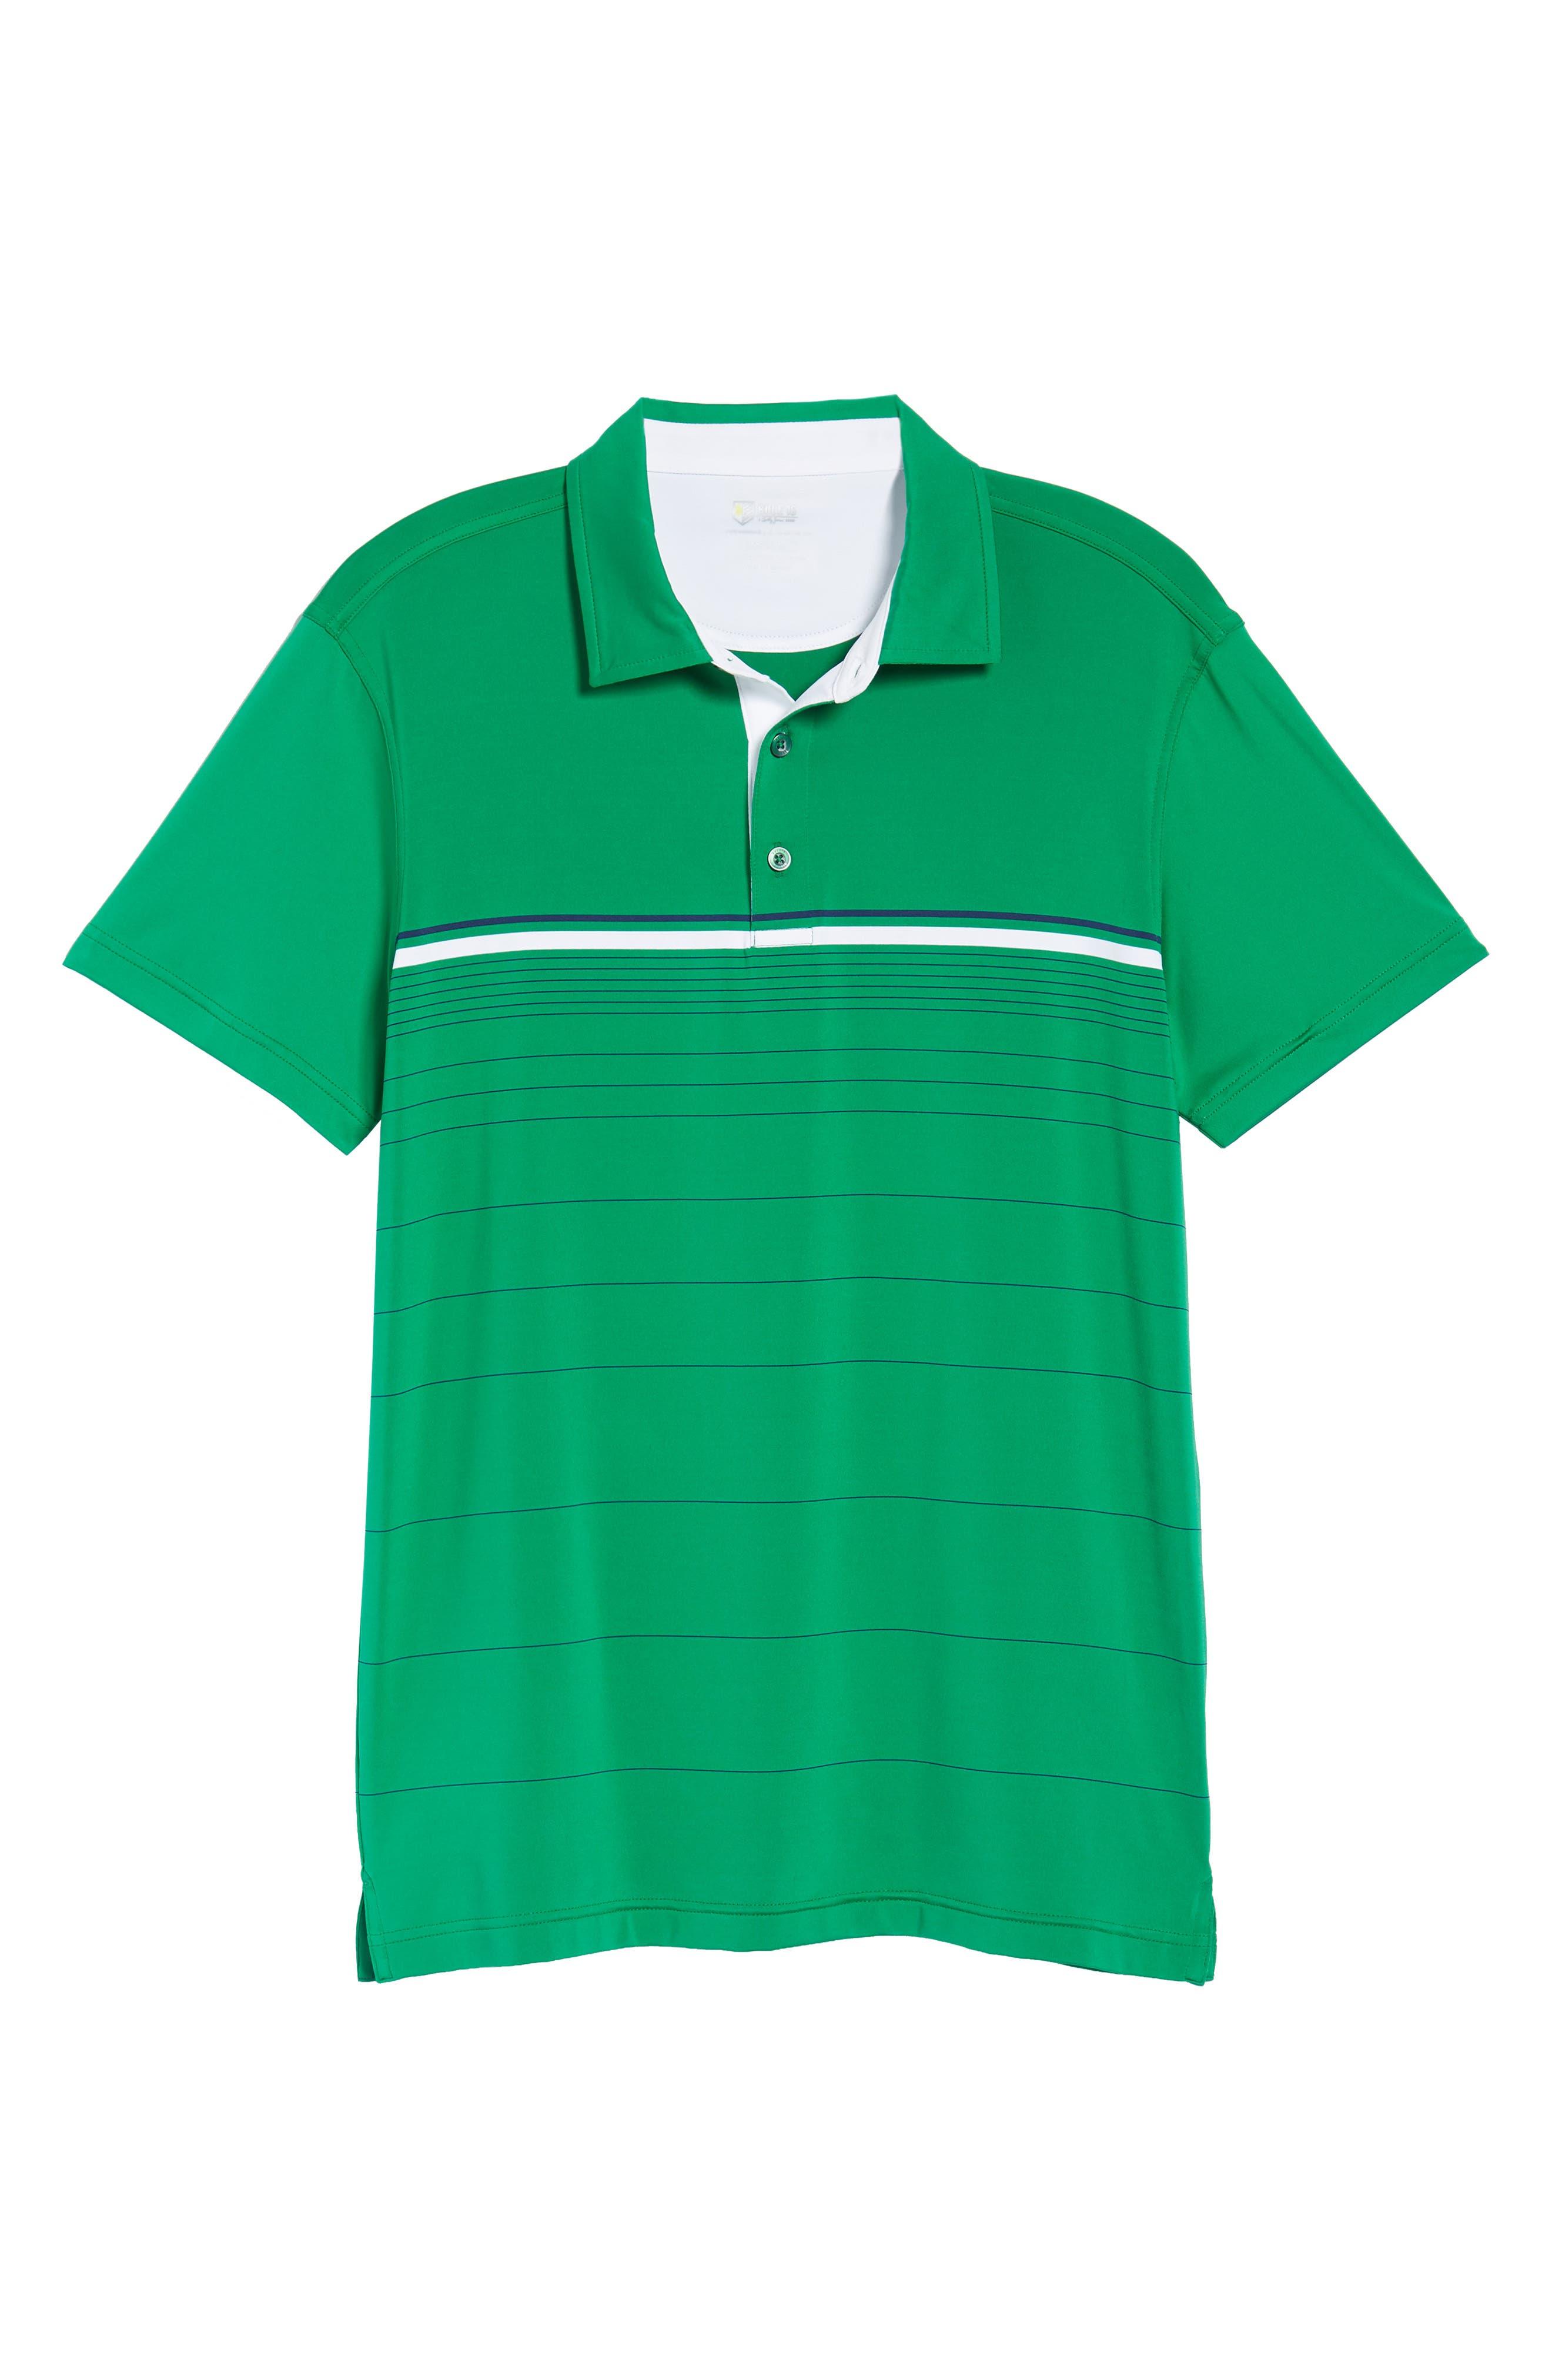 R18 Tech Skill Stripe Polo,                             Alternate thumbnail 6, color,                             KELLY